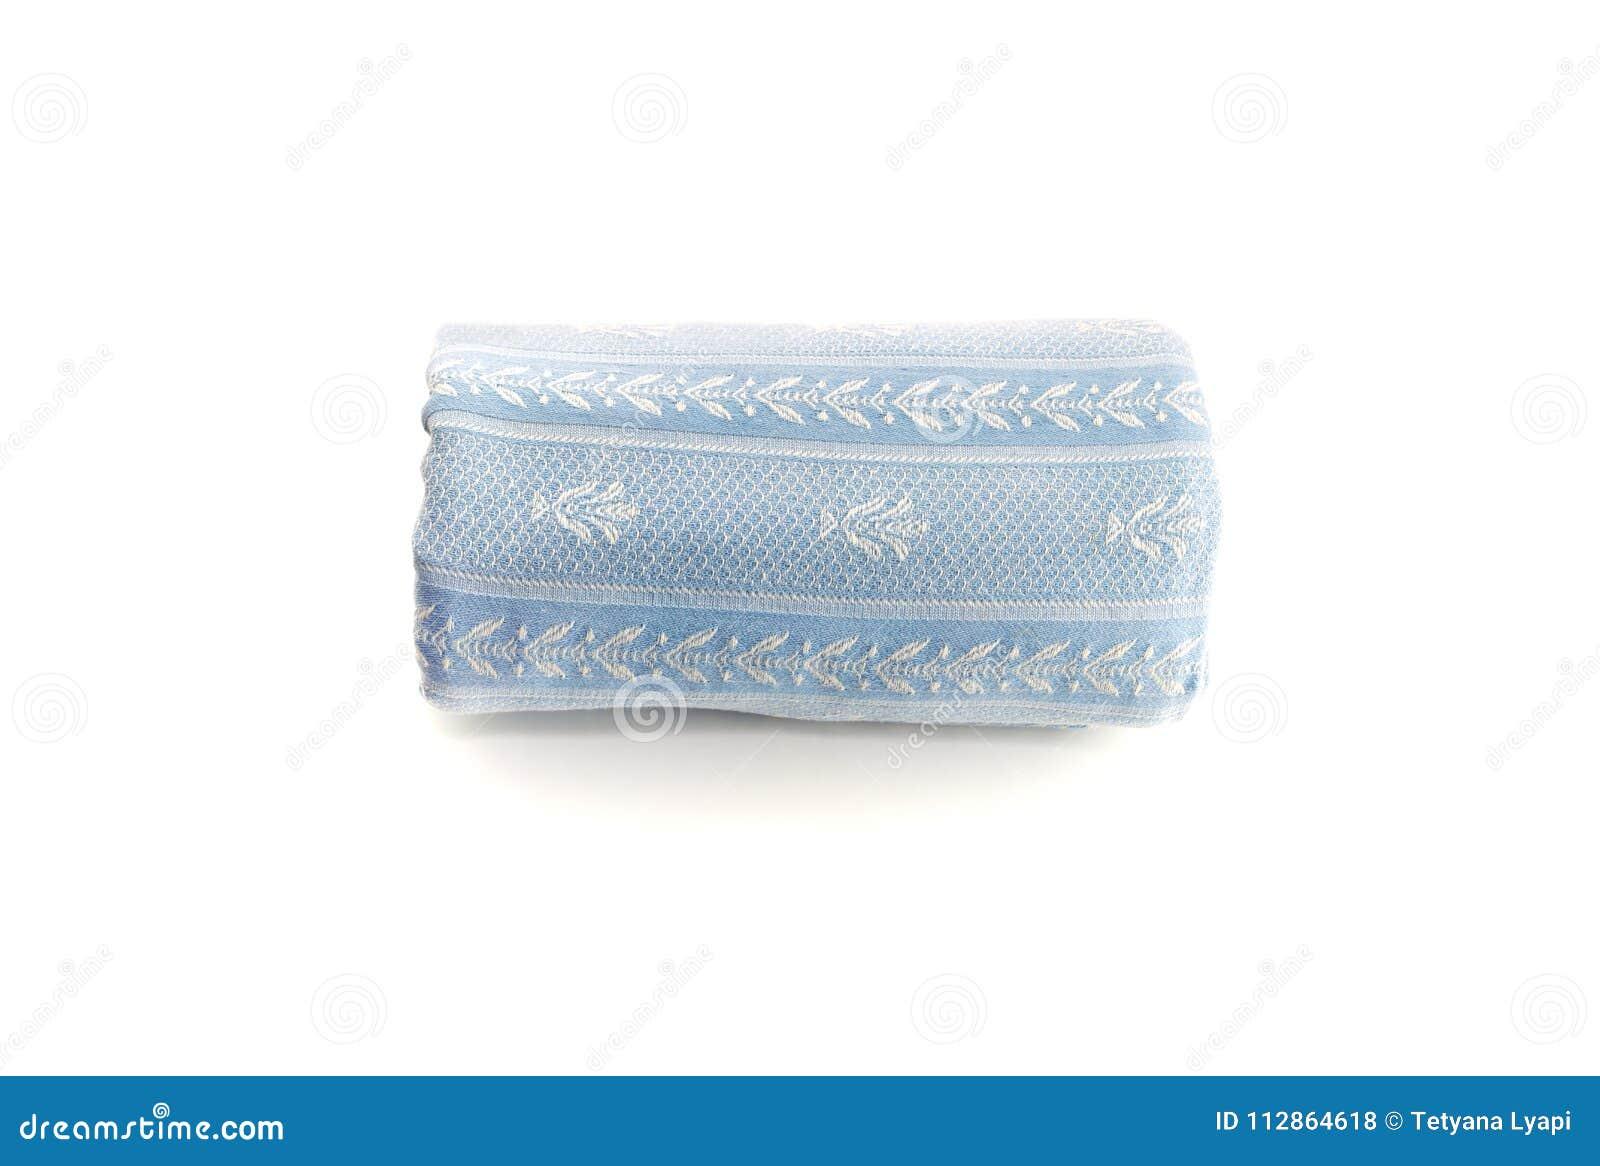 up blue blanket white background the best attitude 0c717 778e7 ... 2daa4c2b7